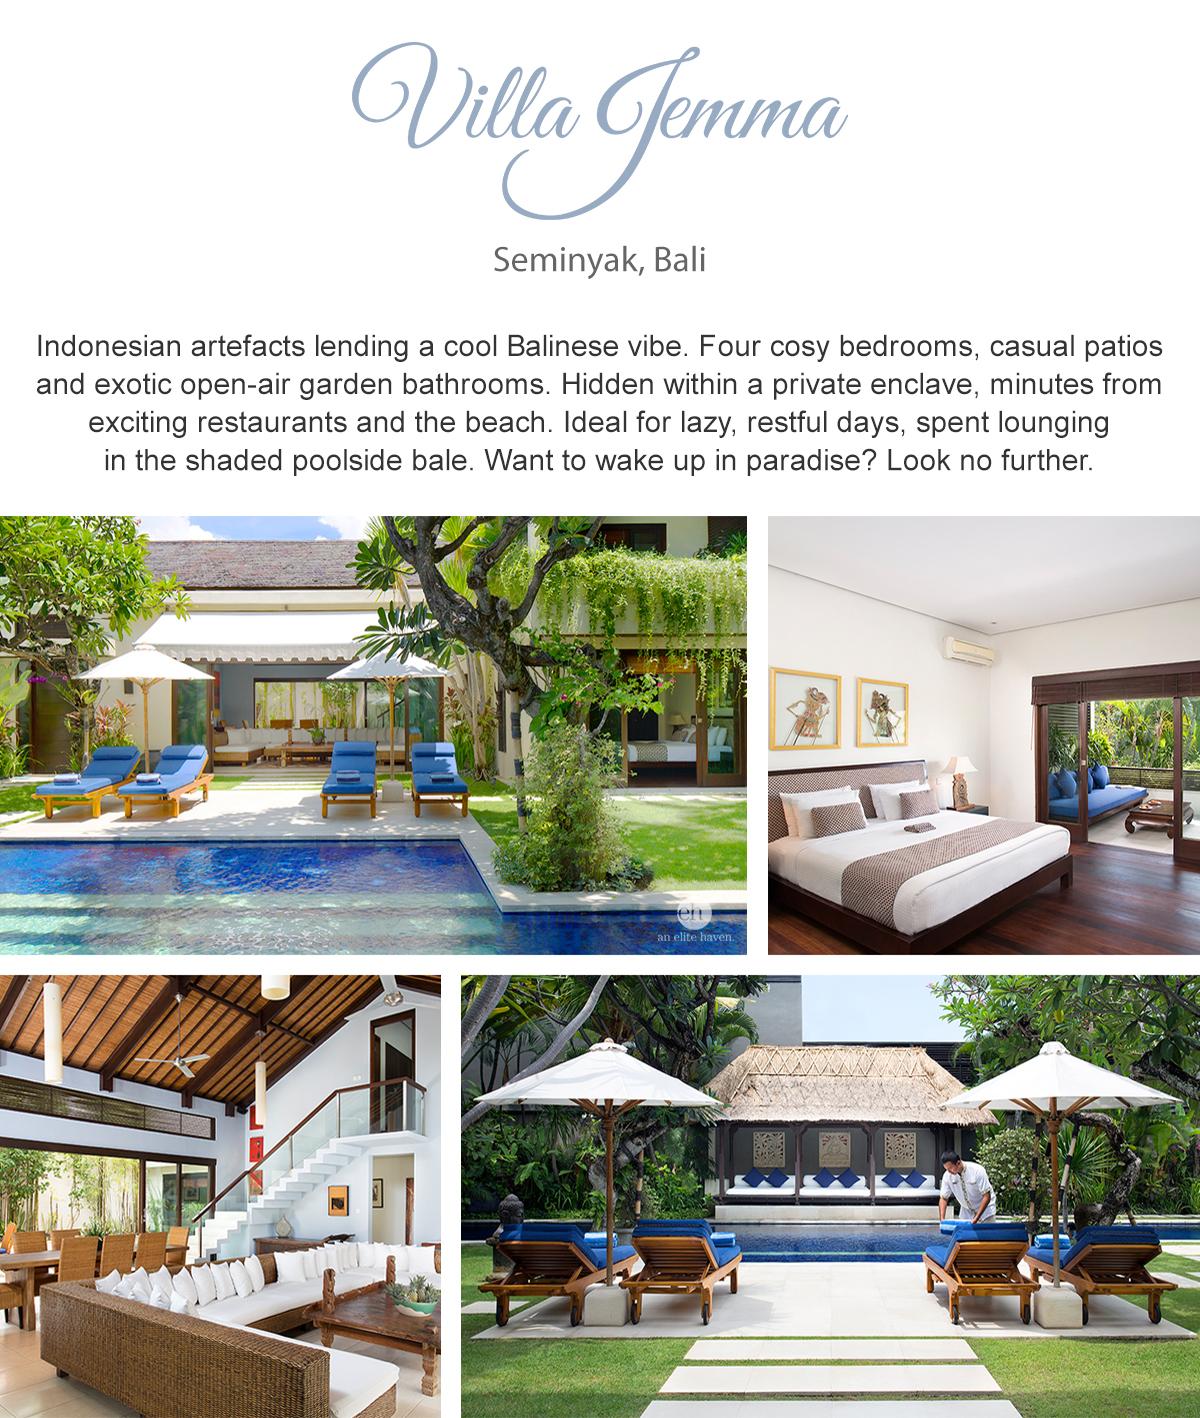 Villa Jemma - Seminyak, Bali